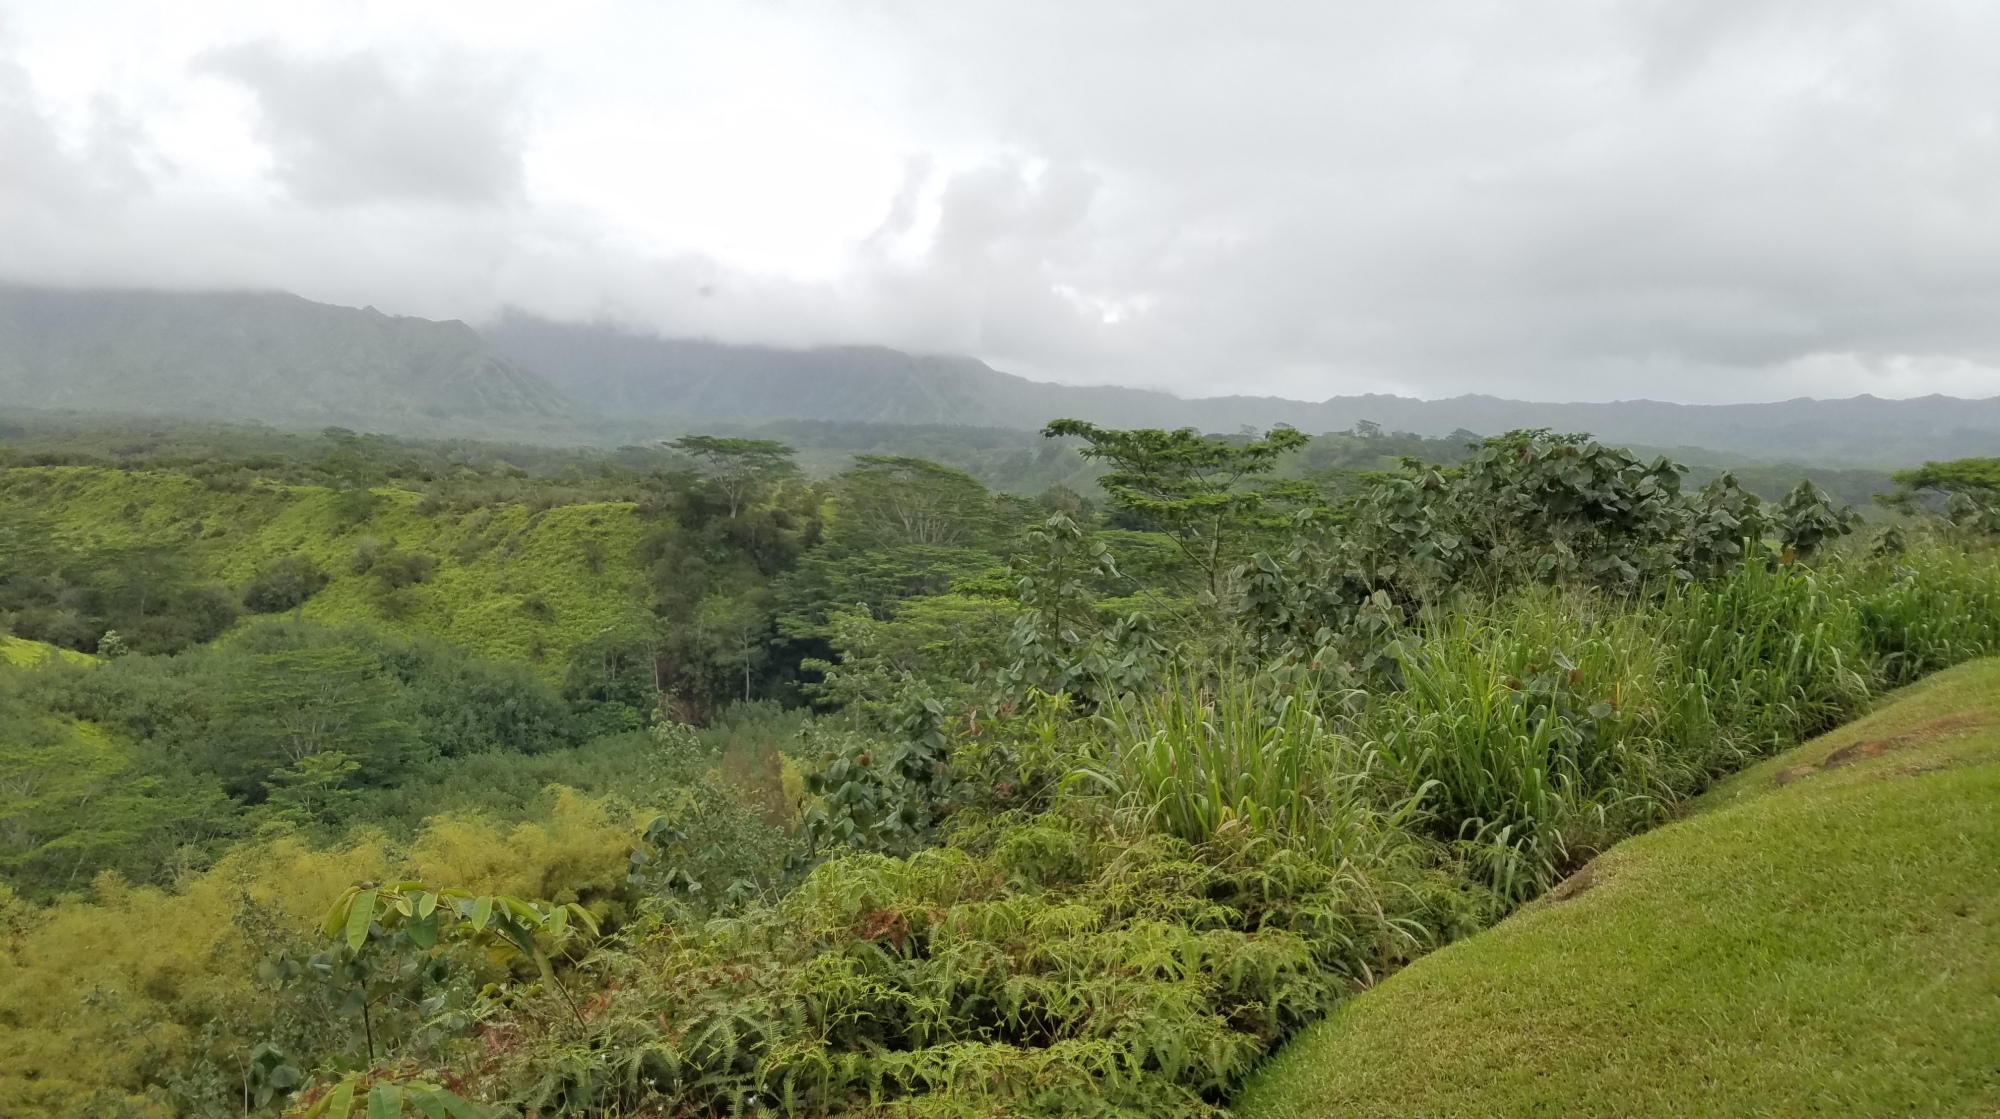 Kauai, Hawaii Travel Guide | Go tubing and zip lining with Kauai Backcountry Adventures